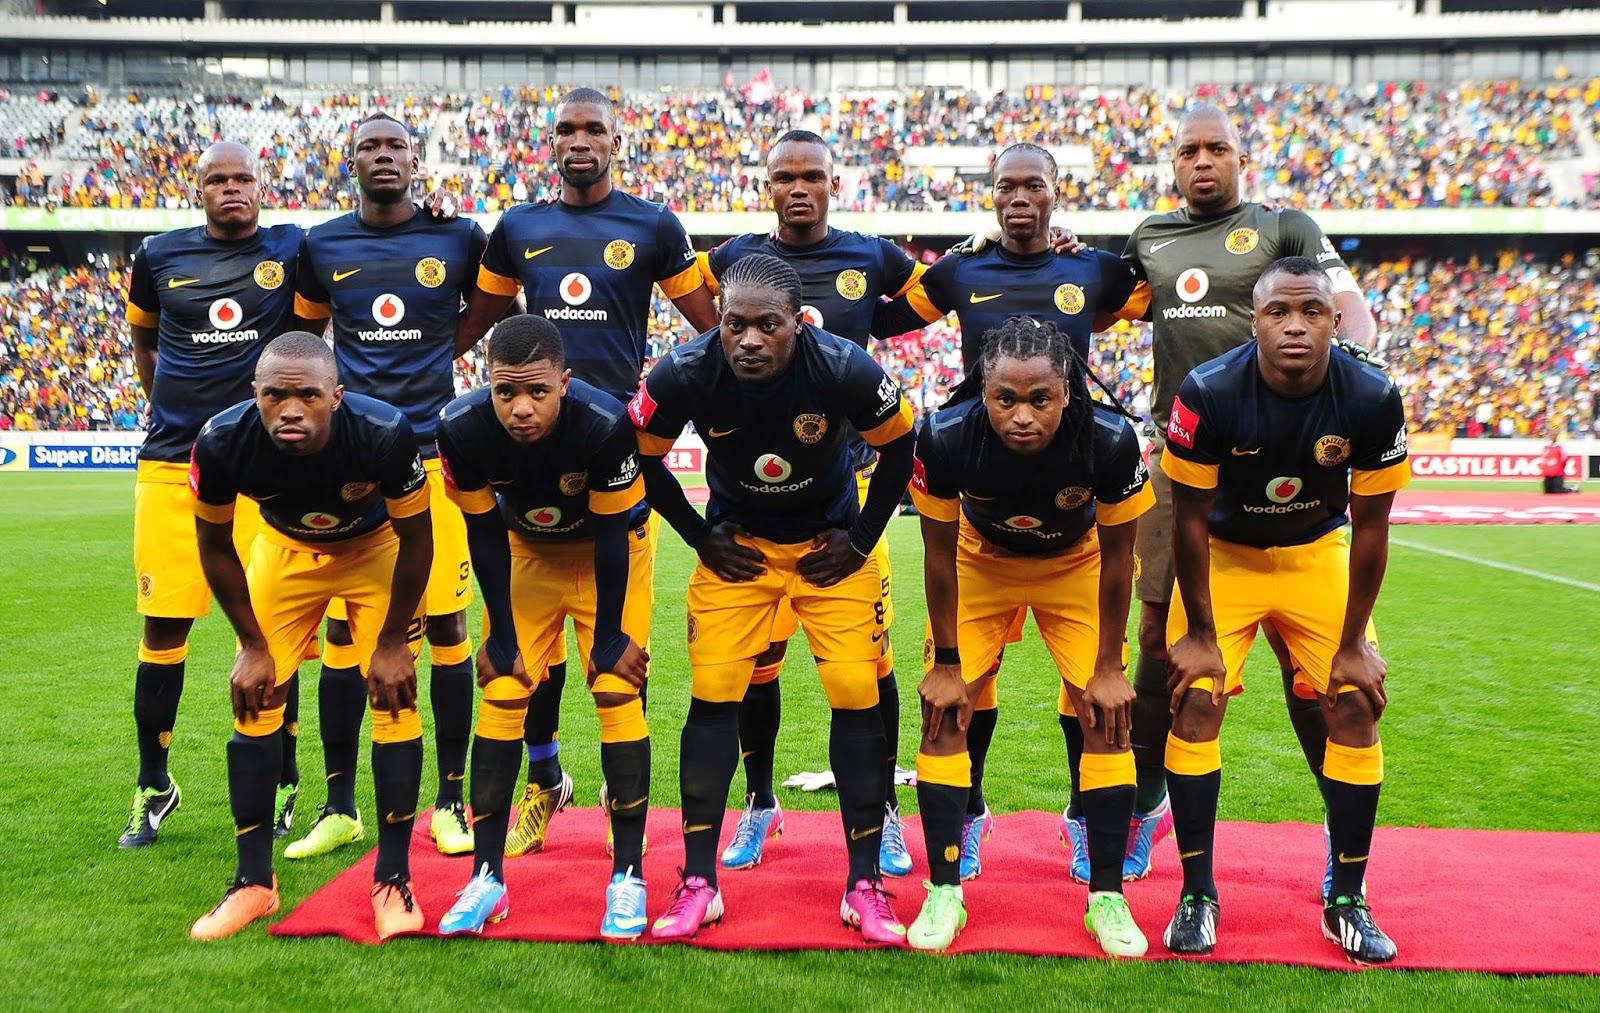 Kaizer Chiefs: Mokanyane Congratulates Absa Premiership Champions Kaizer